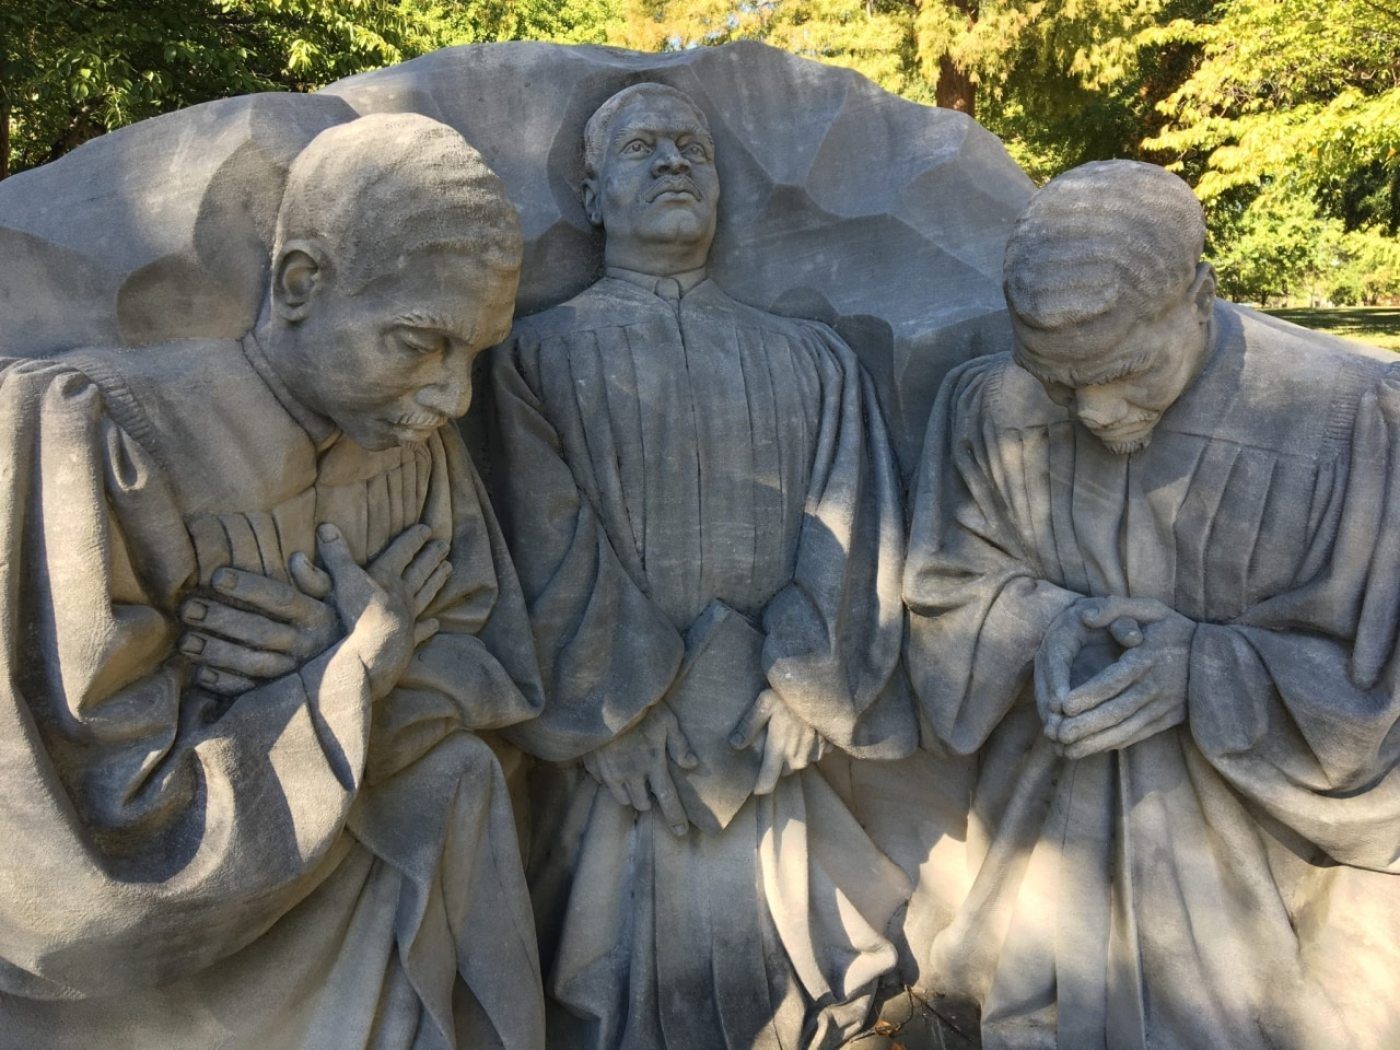 Three pastors monument at Kelly Ingram Park in the Birmingham Civil Rights District